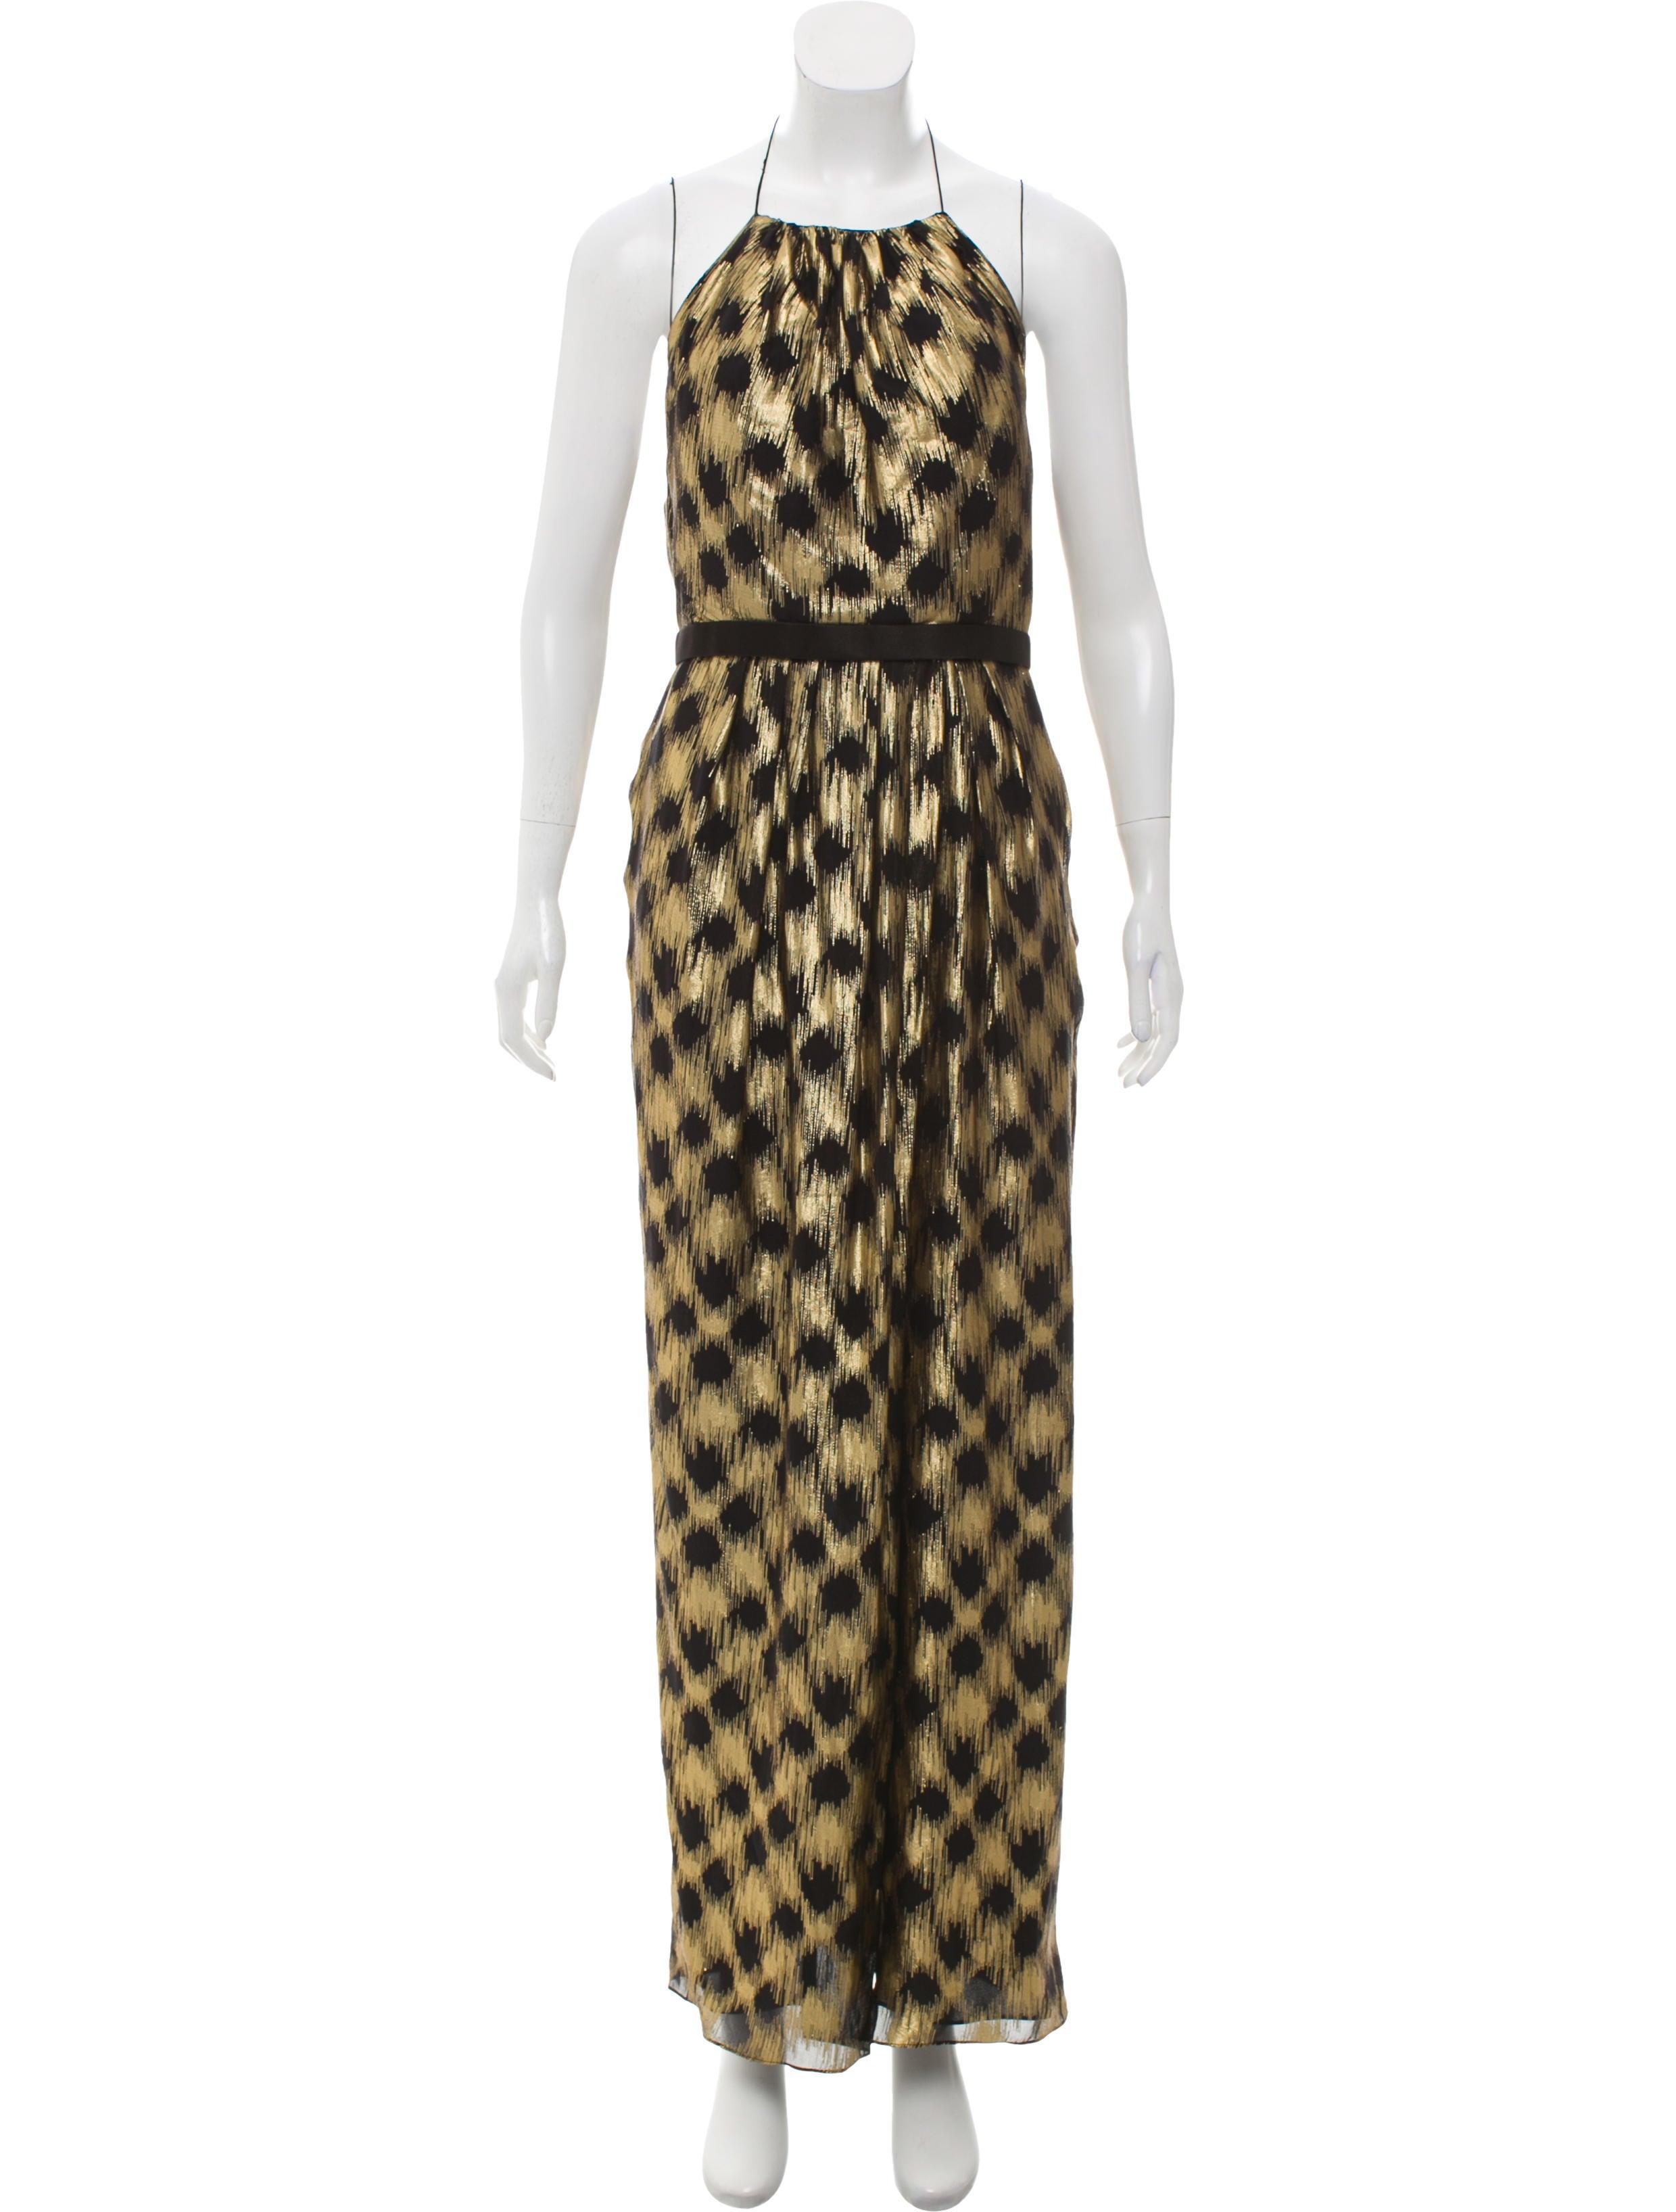 Jason Wu Lurex Maxi Dress Huge Surprise For Sale Buy Cheap Prices Outlet Store Ebay For Sale Countdown Package Sale Online LNSQMKltN